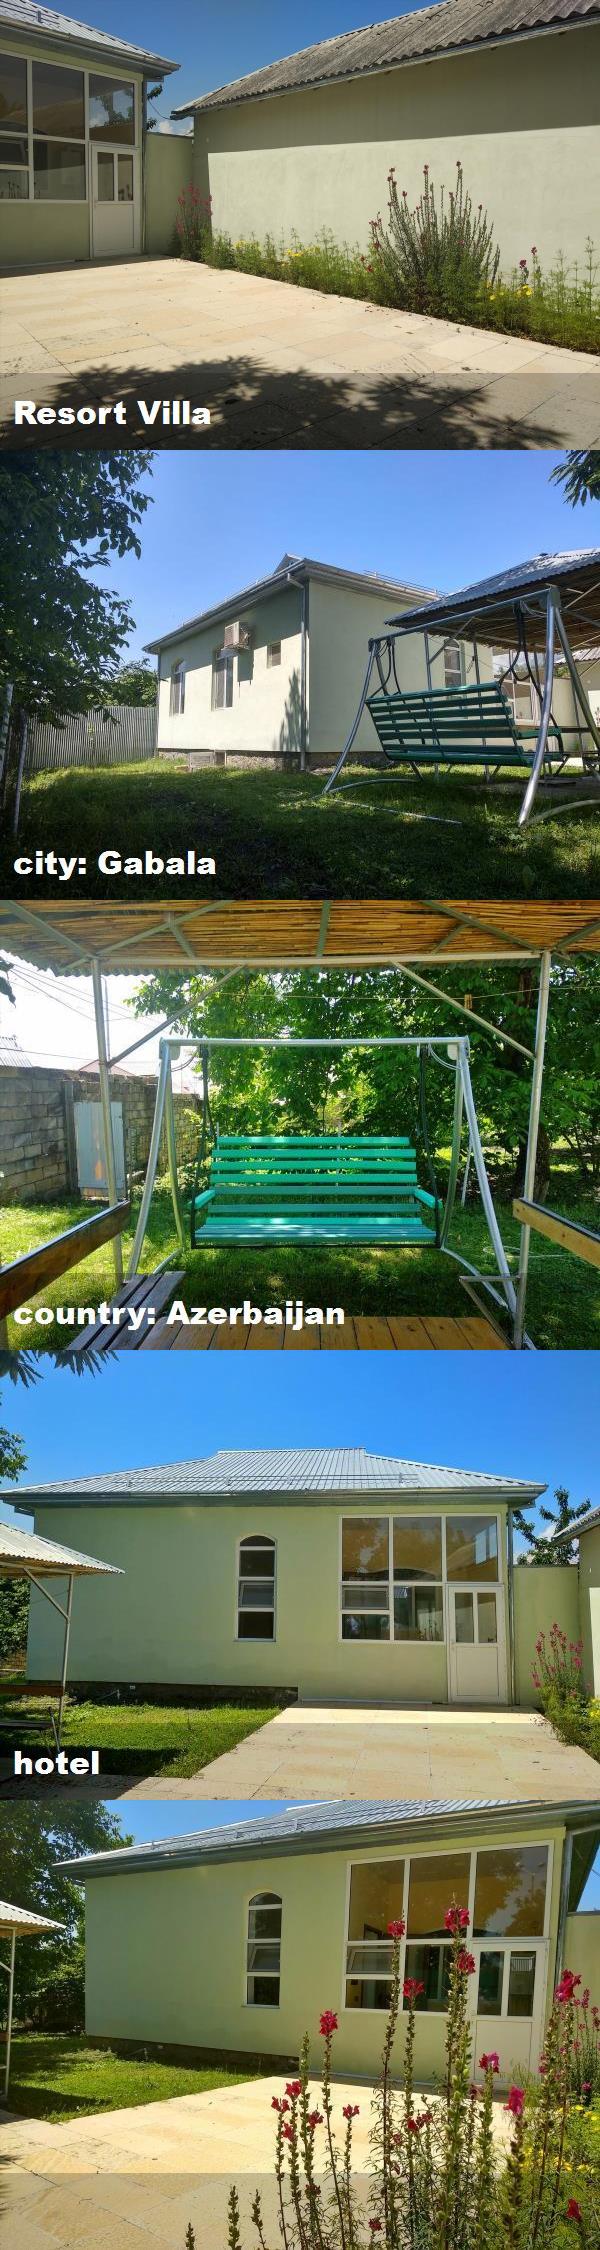 Resort Villa City Gabala Country Azerbaijan Hotel Resort Villa Hotel House Styles